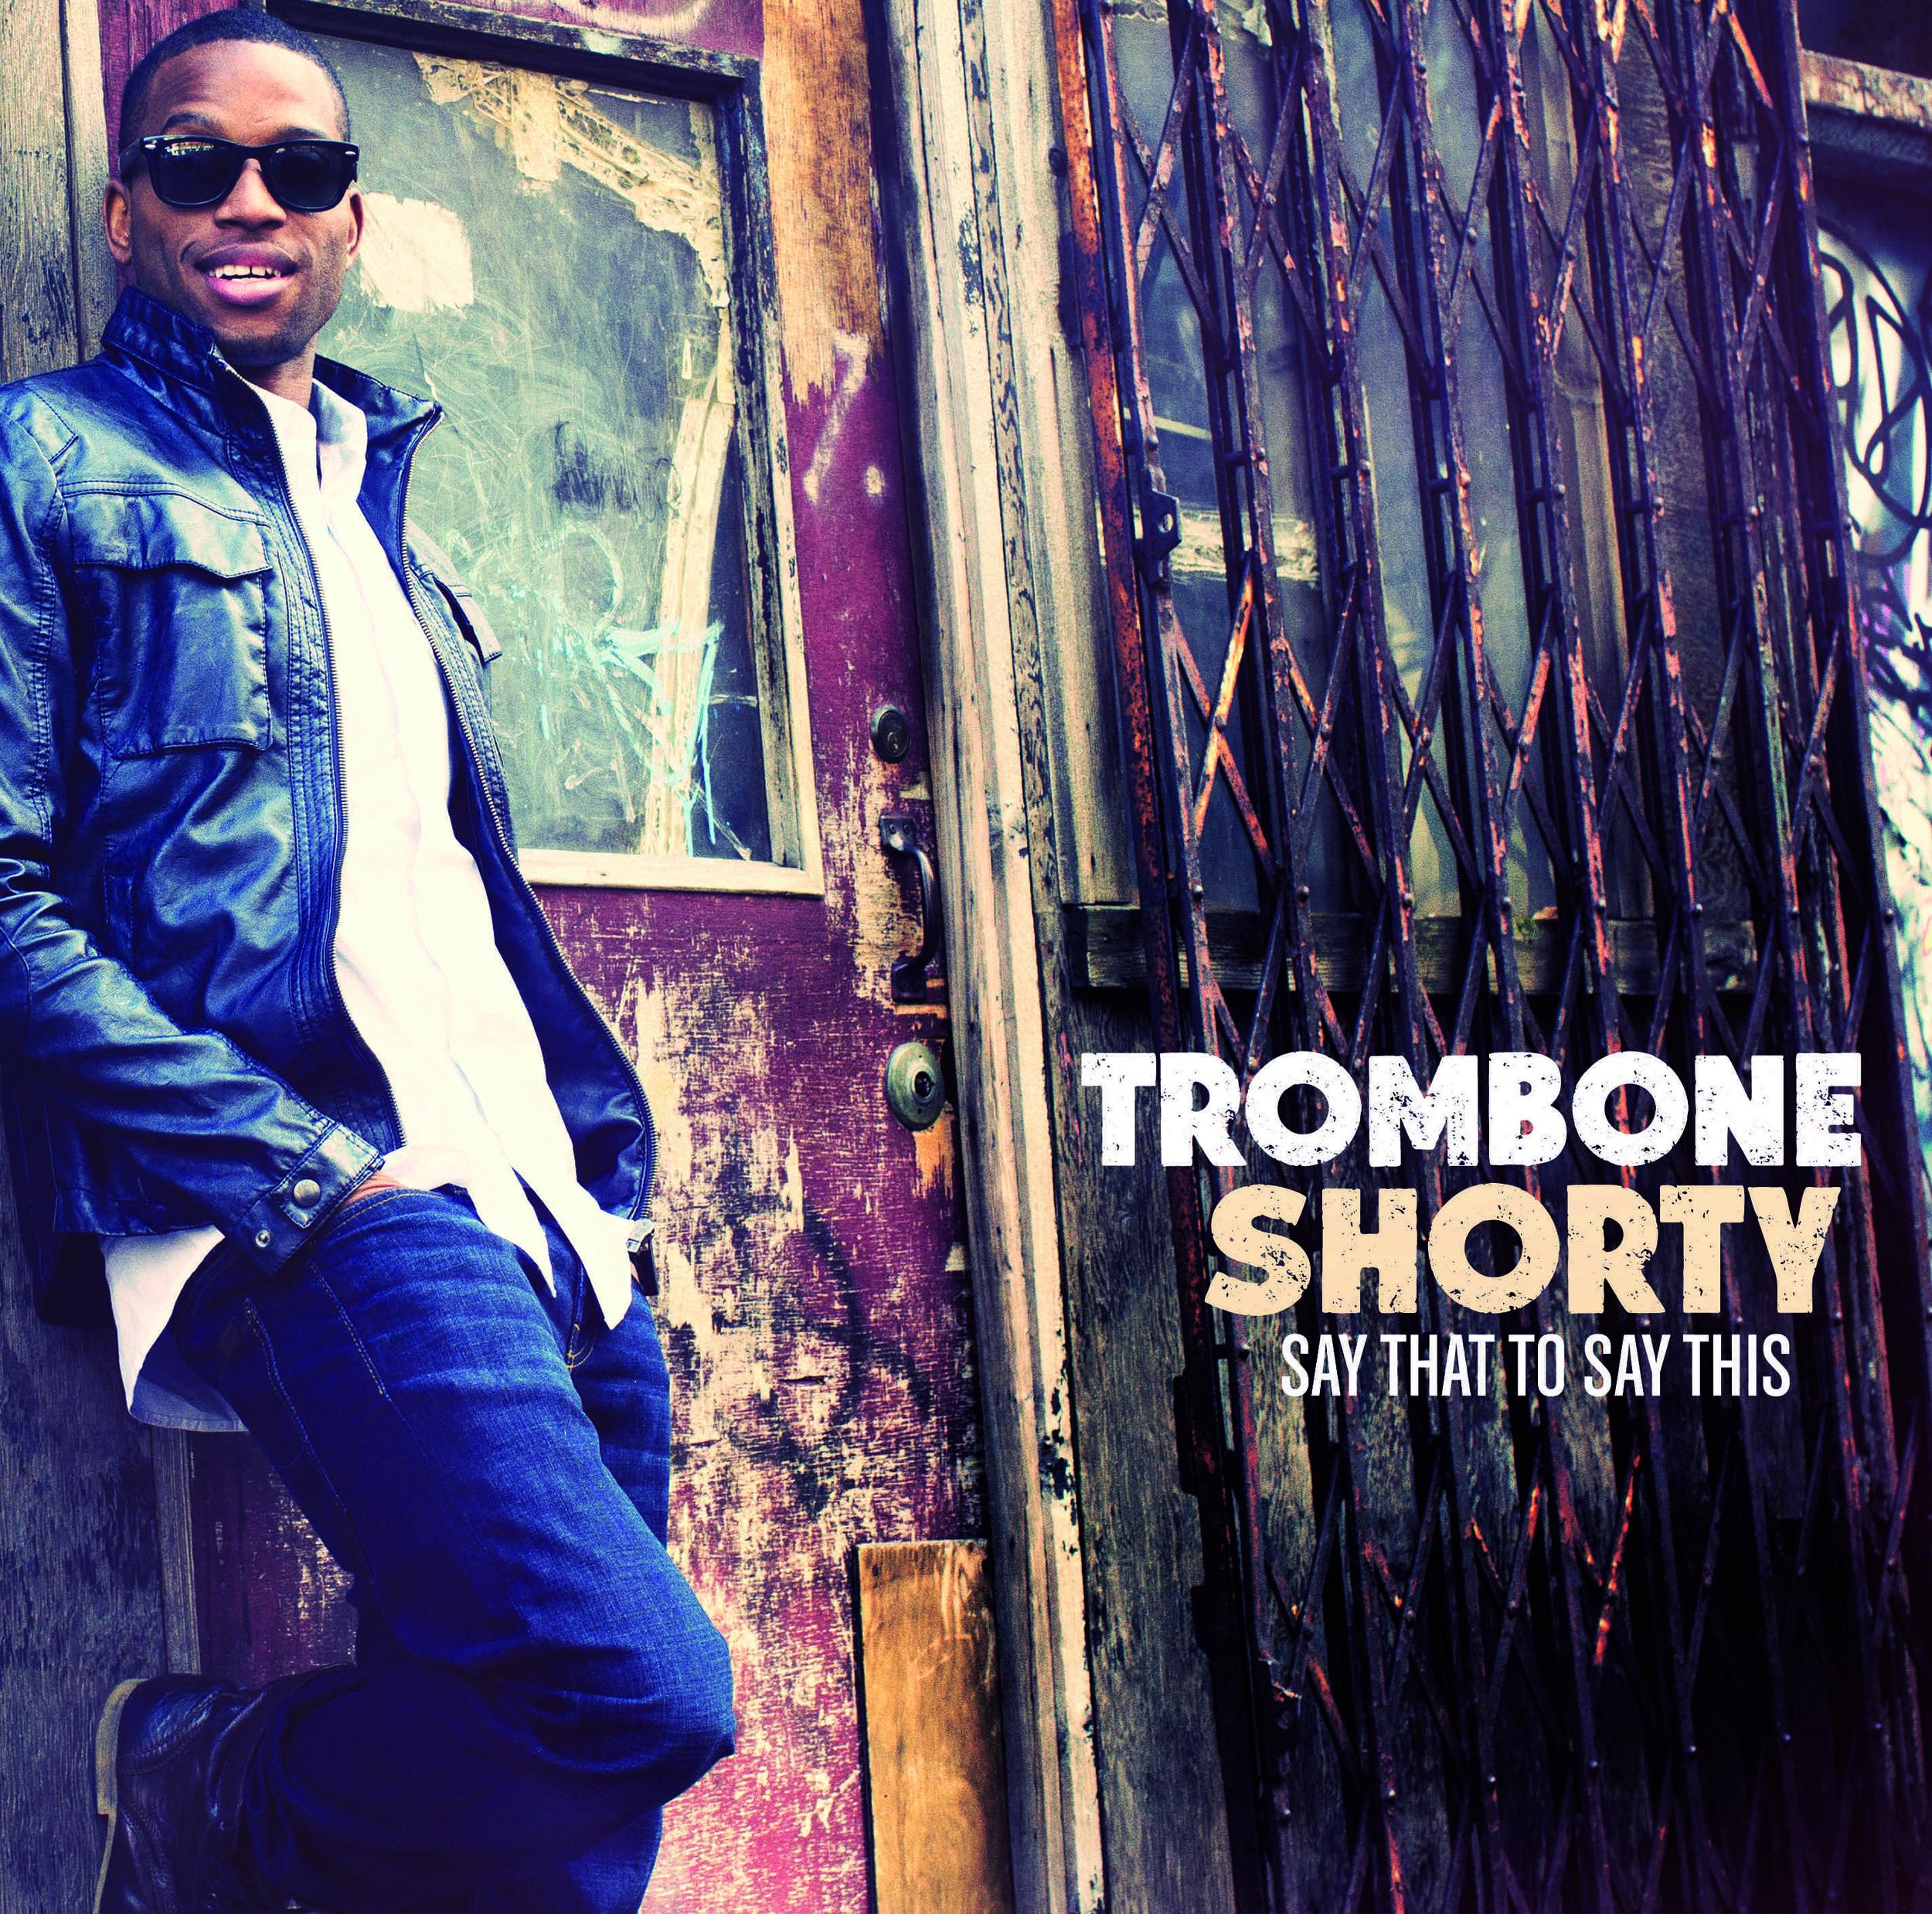 trombone shorty.jpg